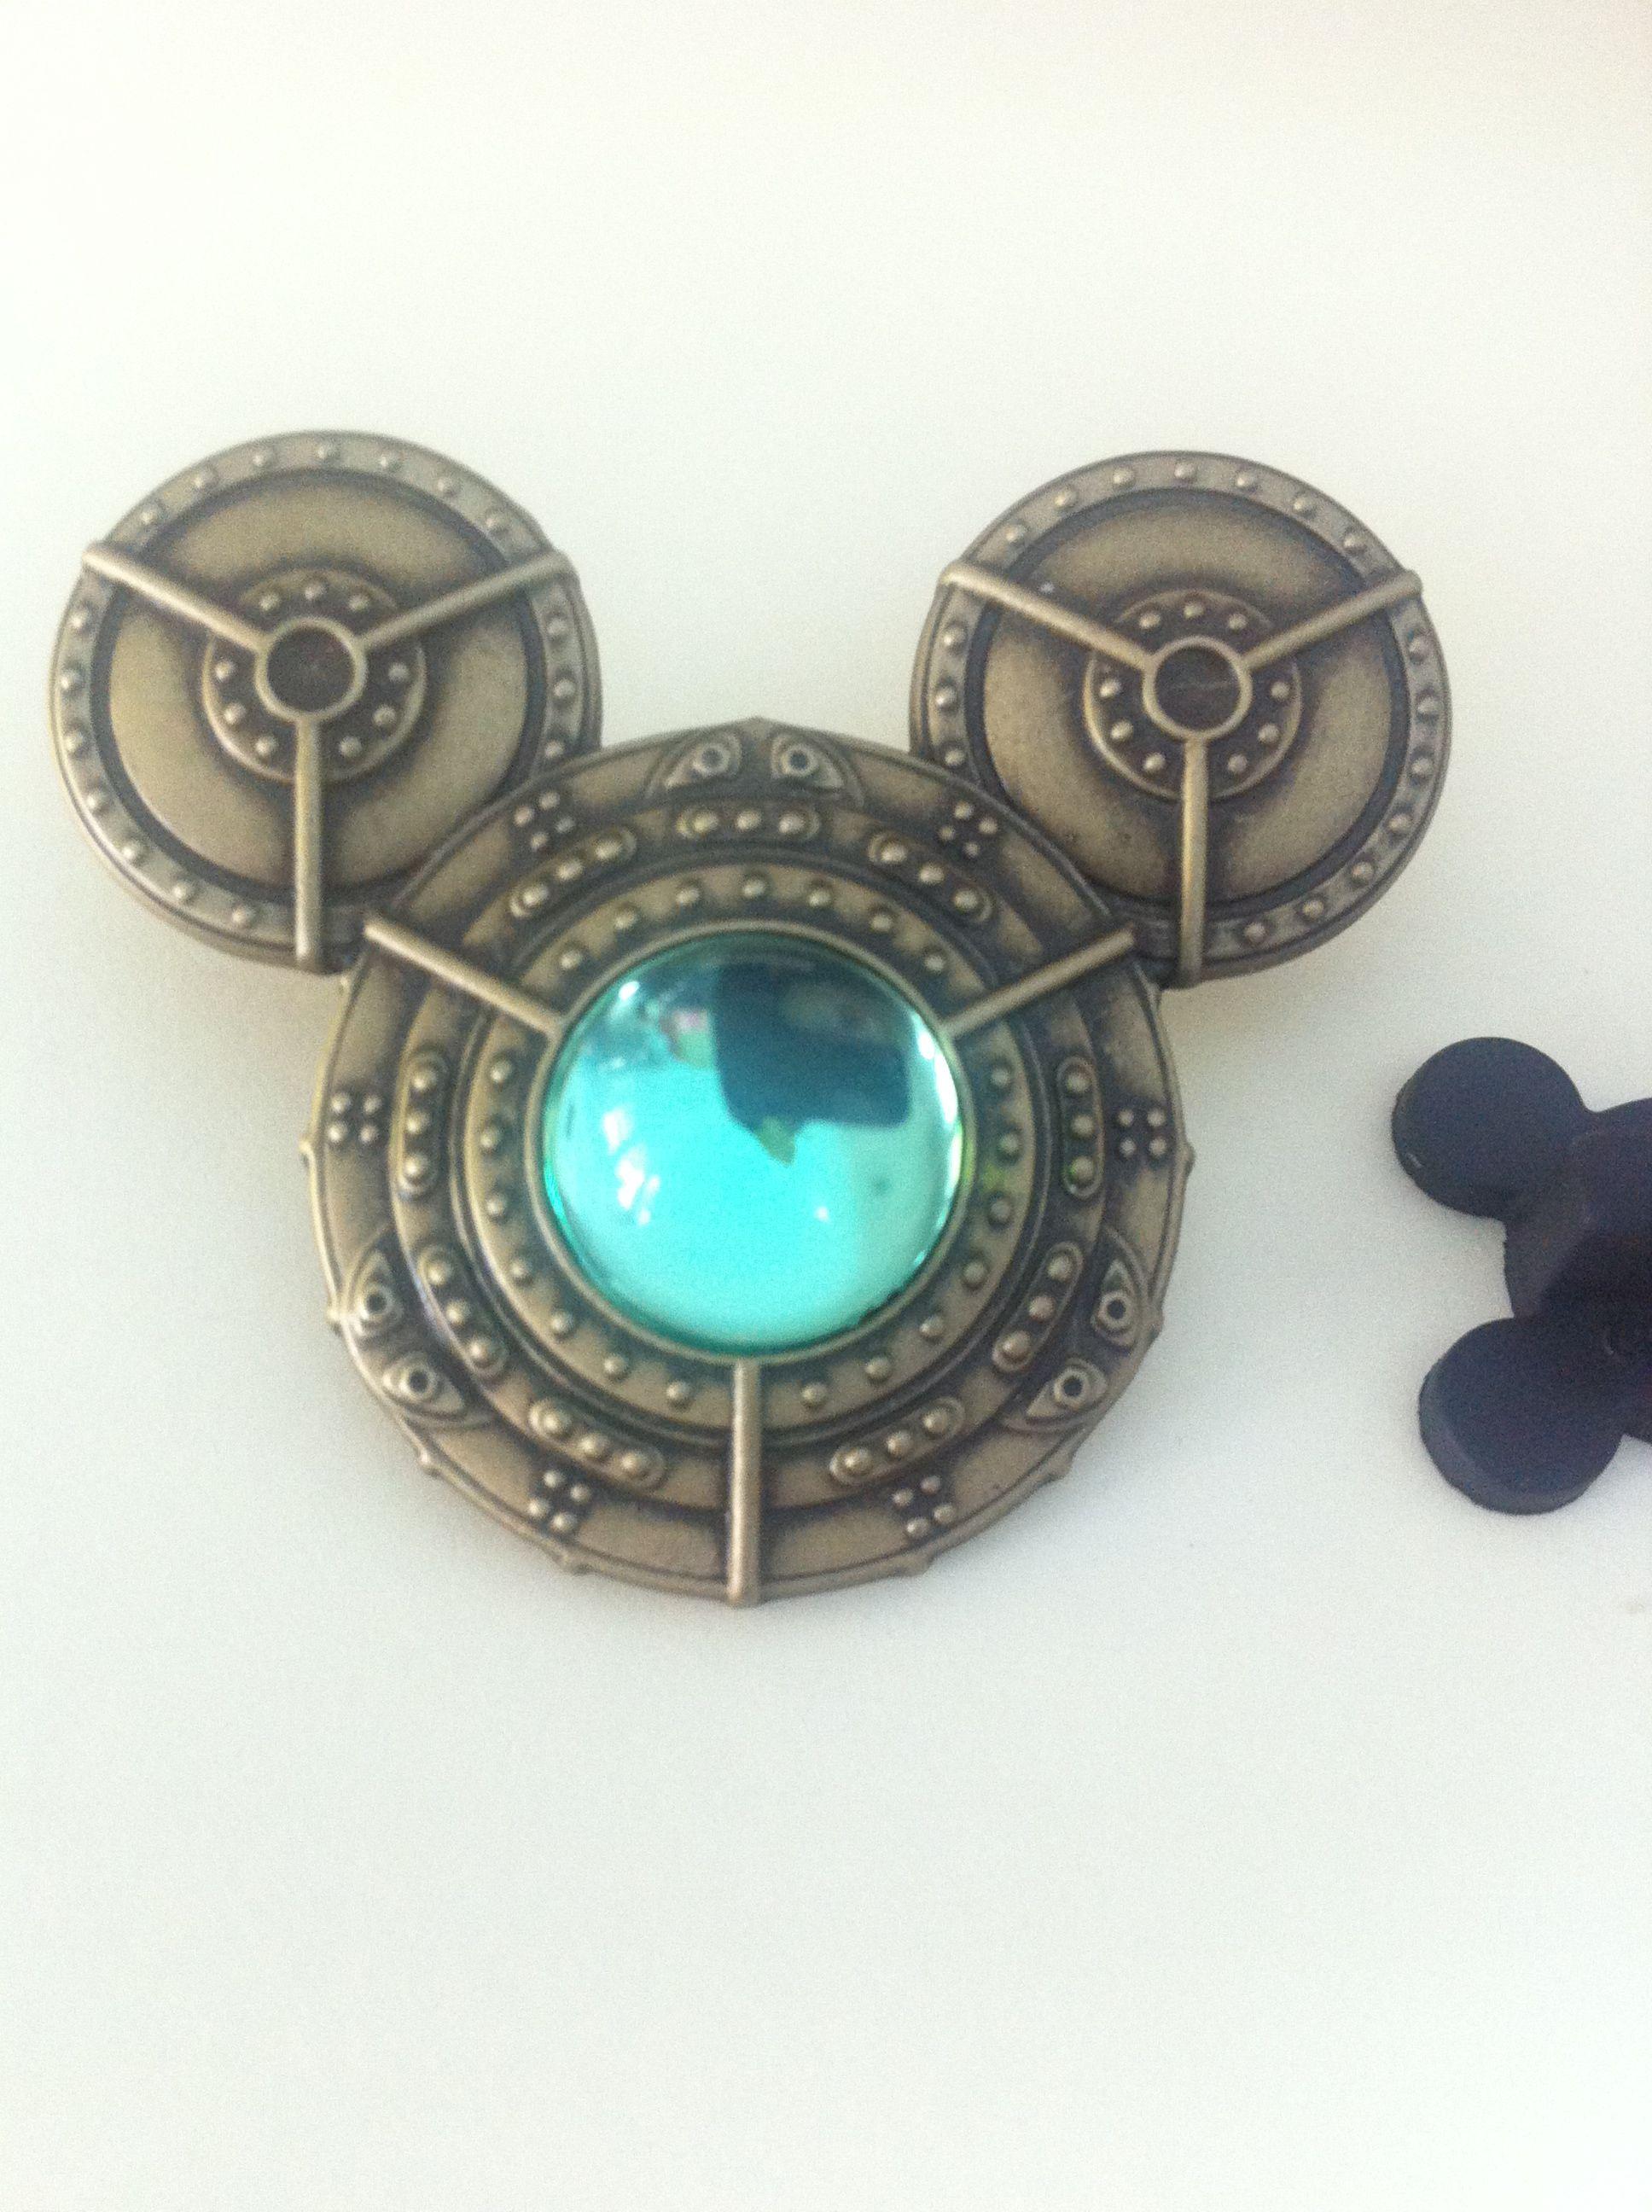 Pin by Brian Chavez on Disney trading pins   Disneyland ...